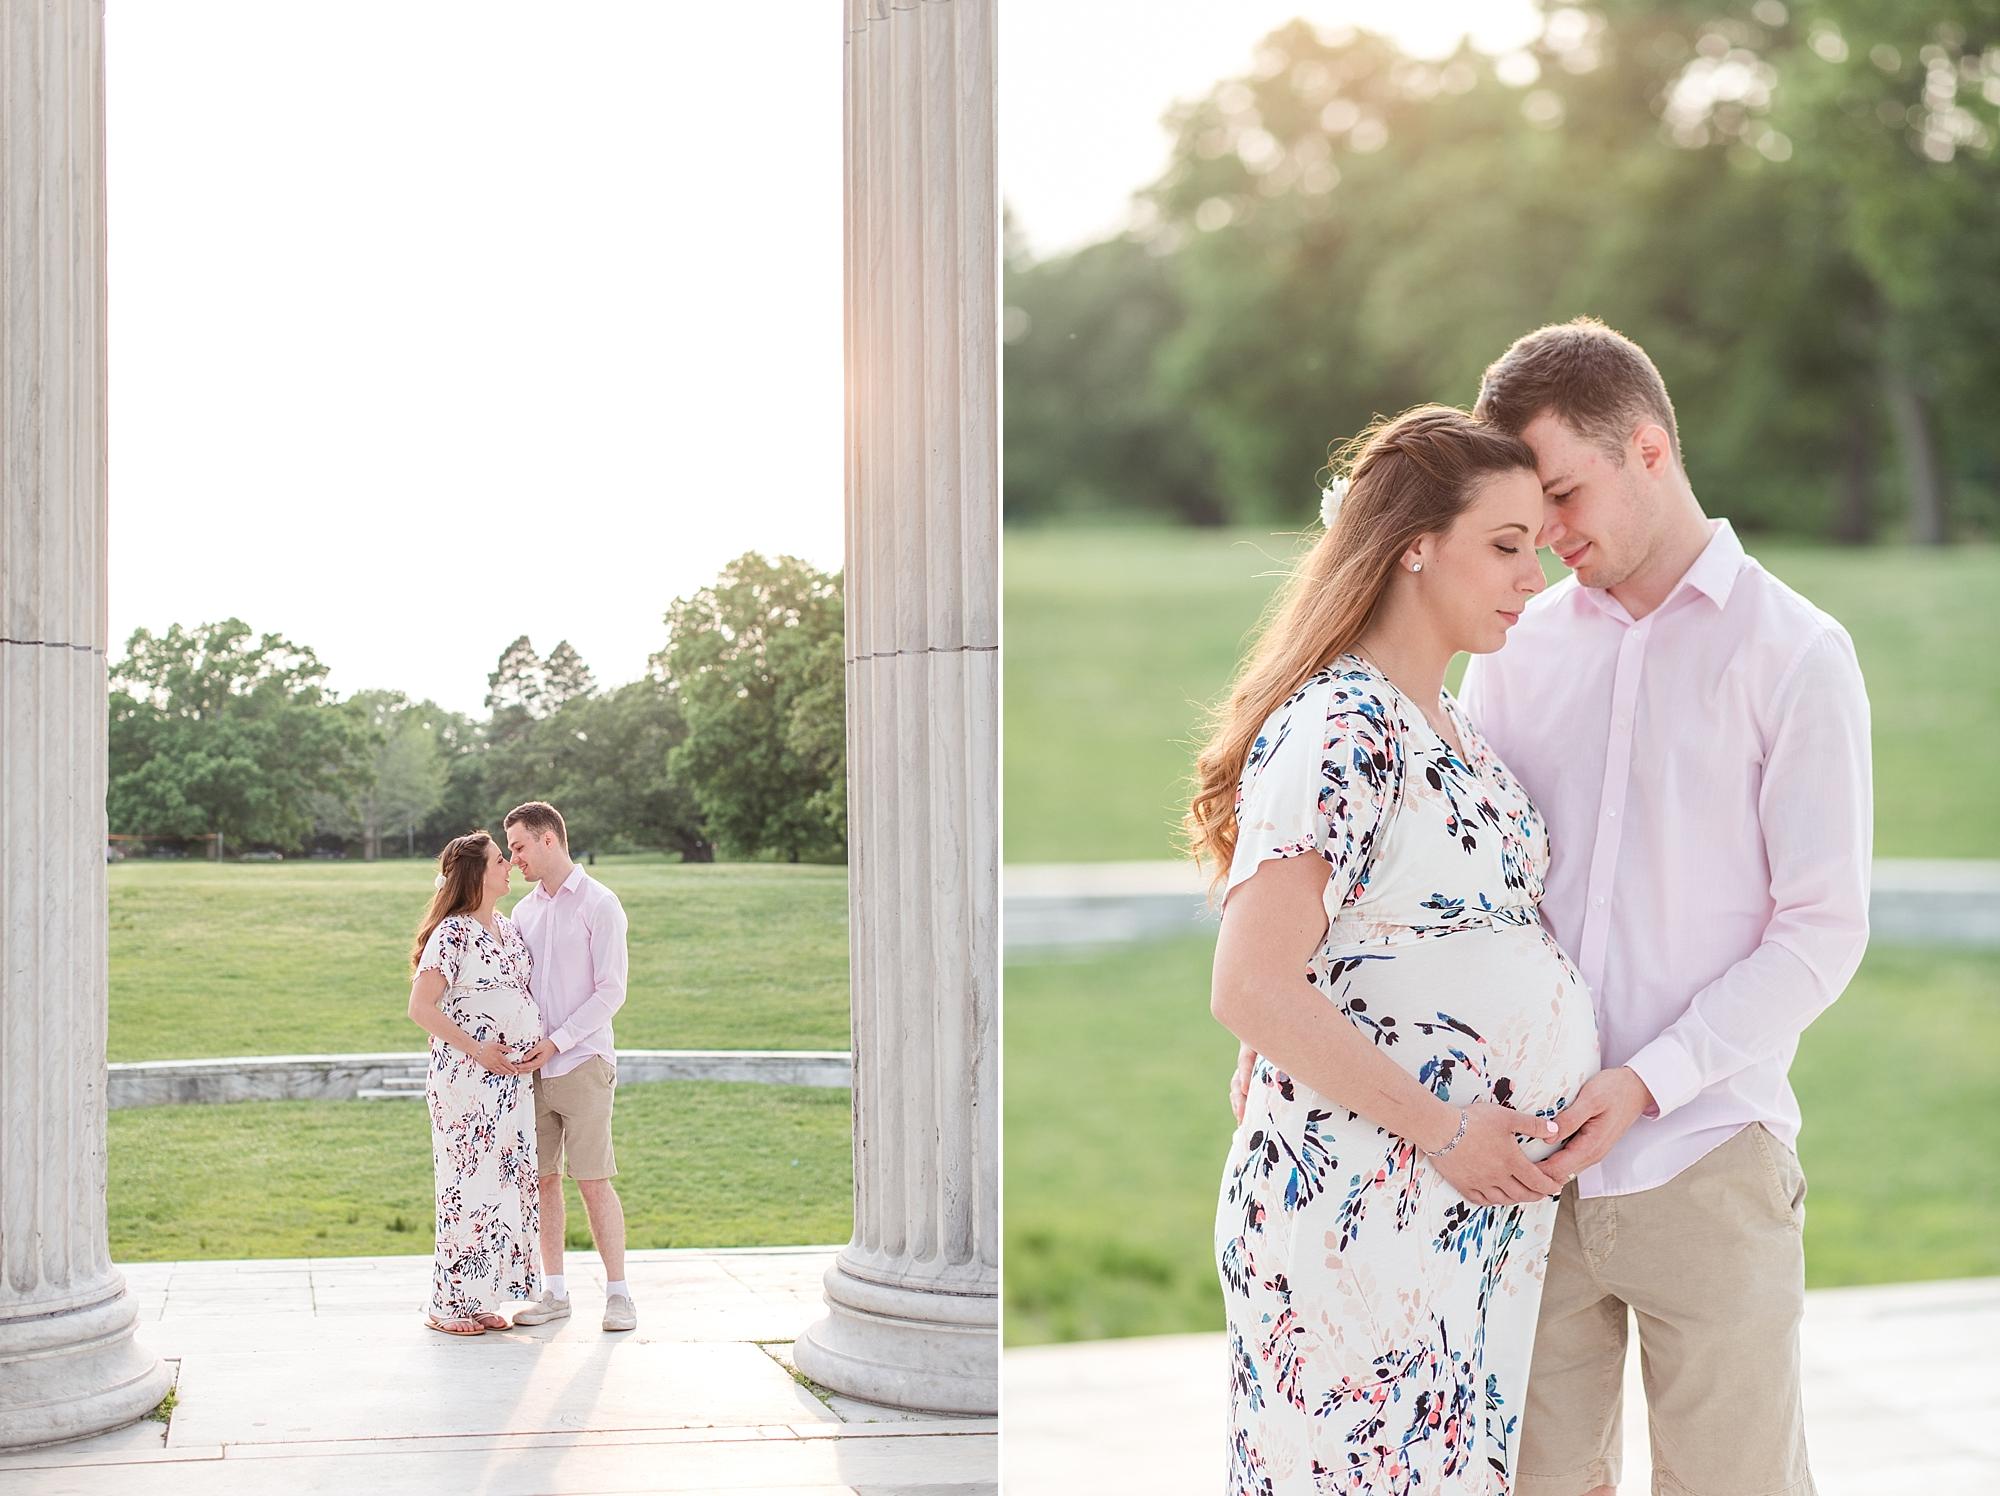 eisley-images-maternity-providence_0001.jpg